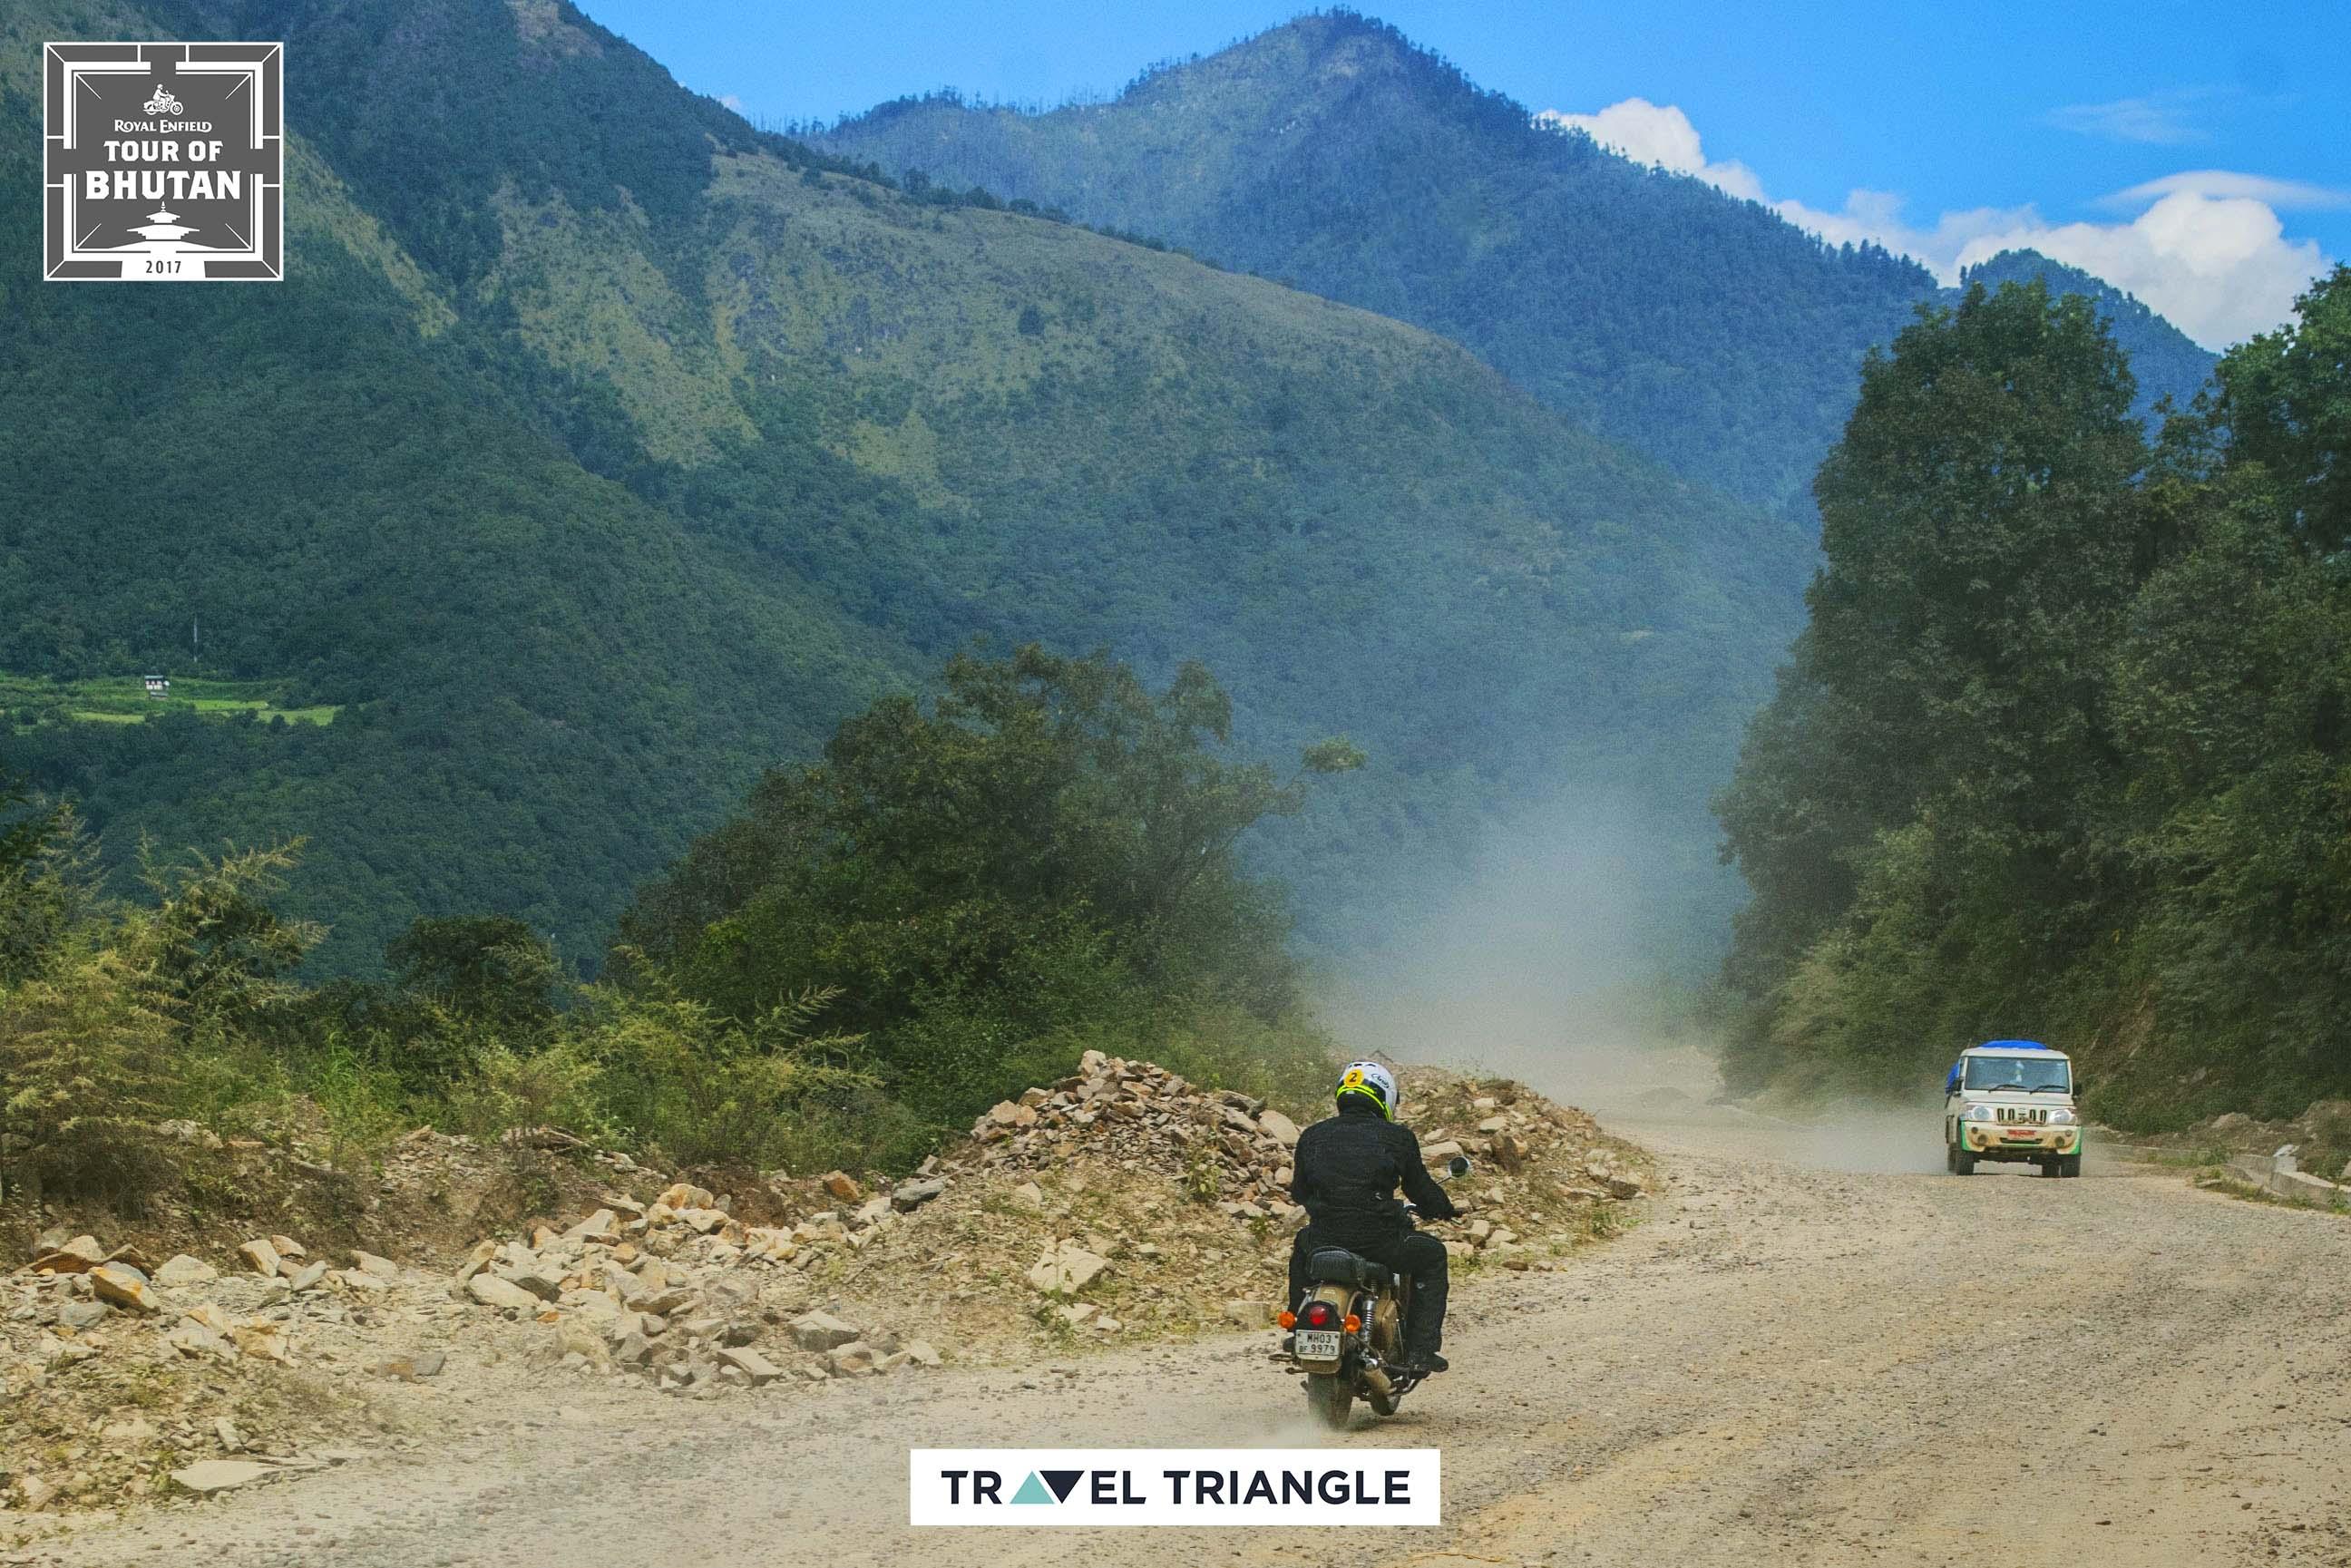 Punakha to Phobjikha: riding through hills